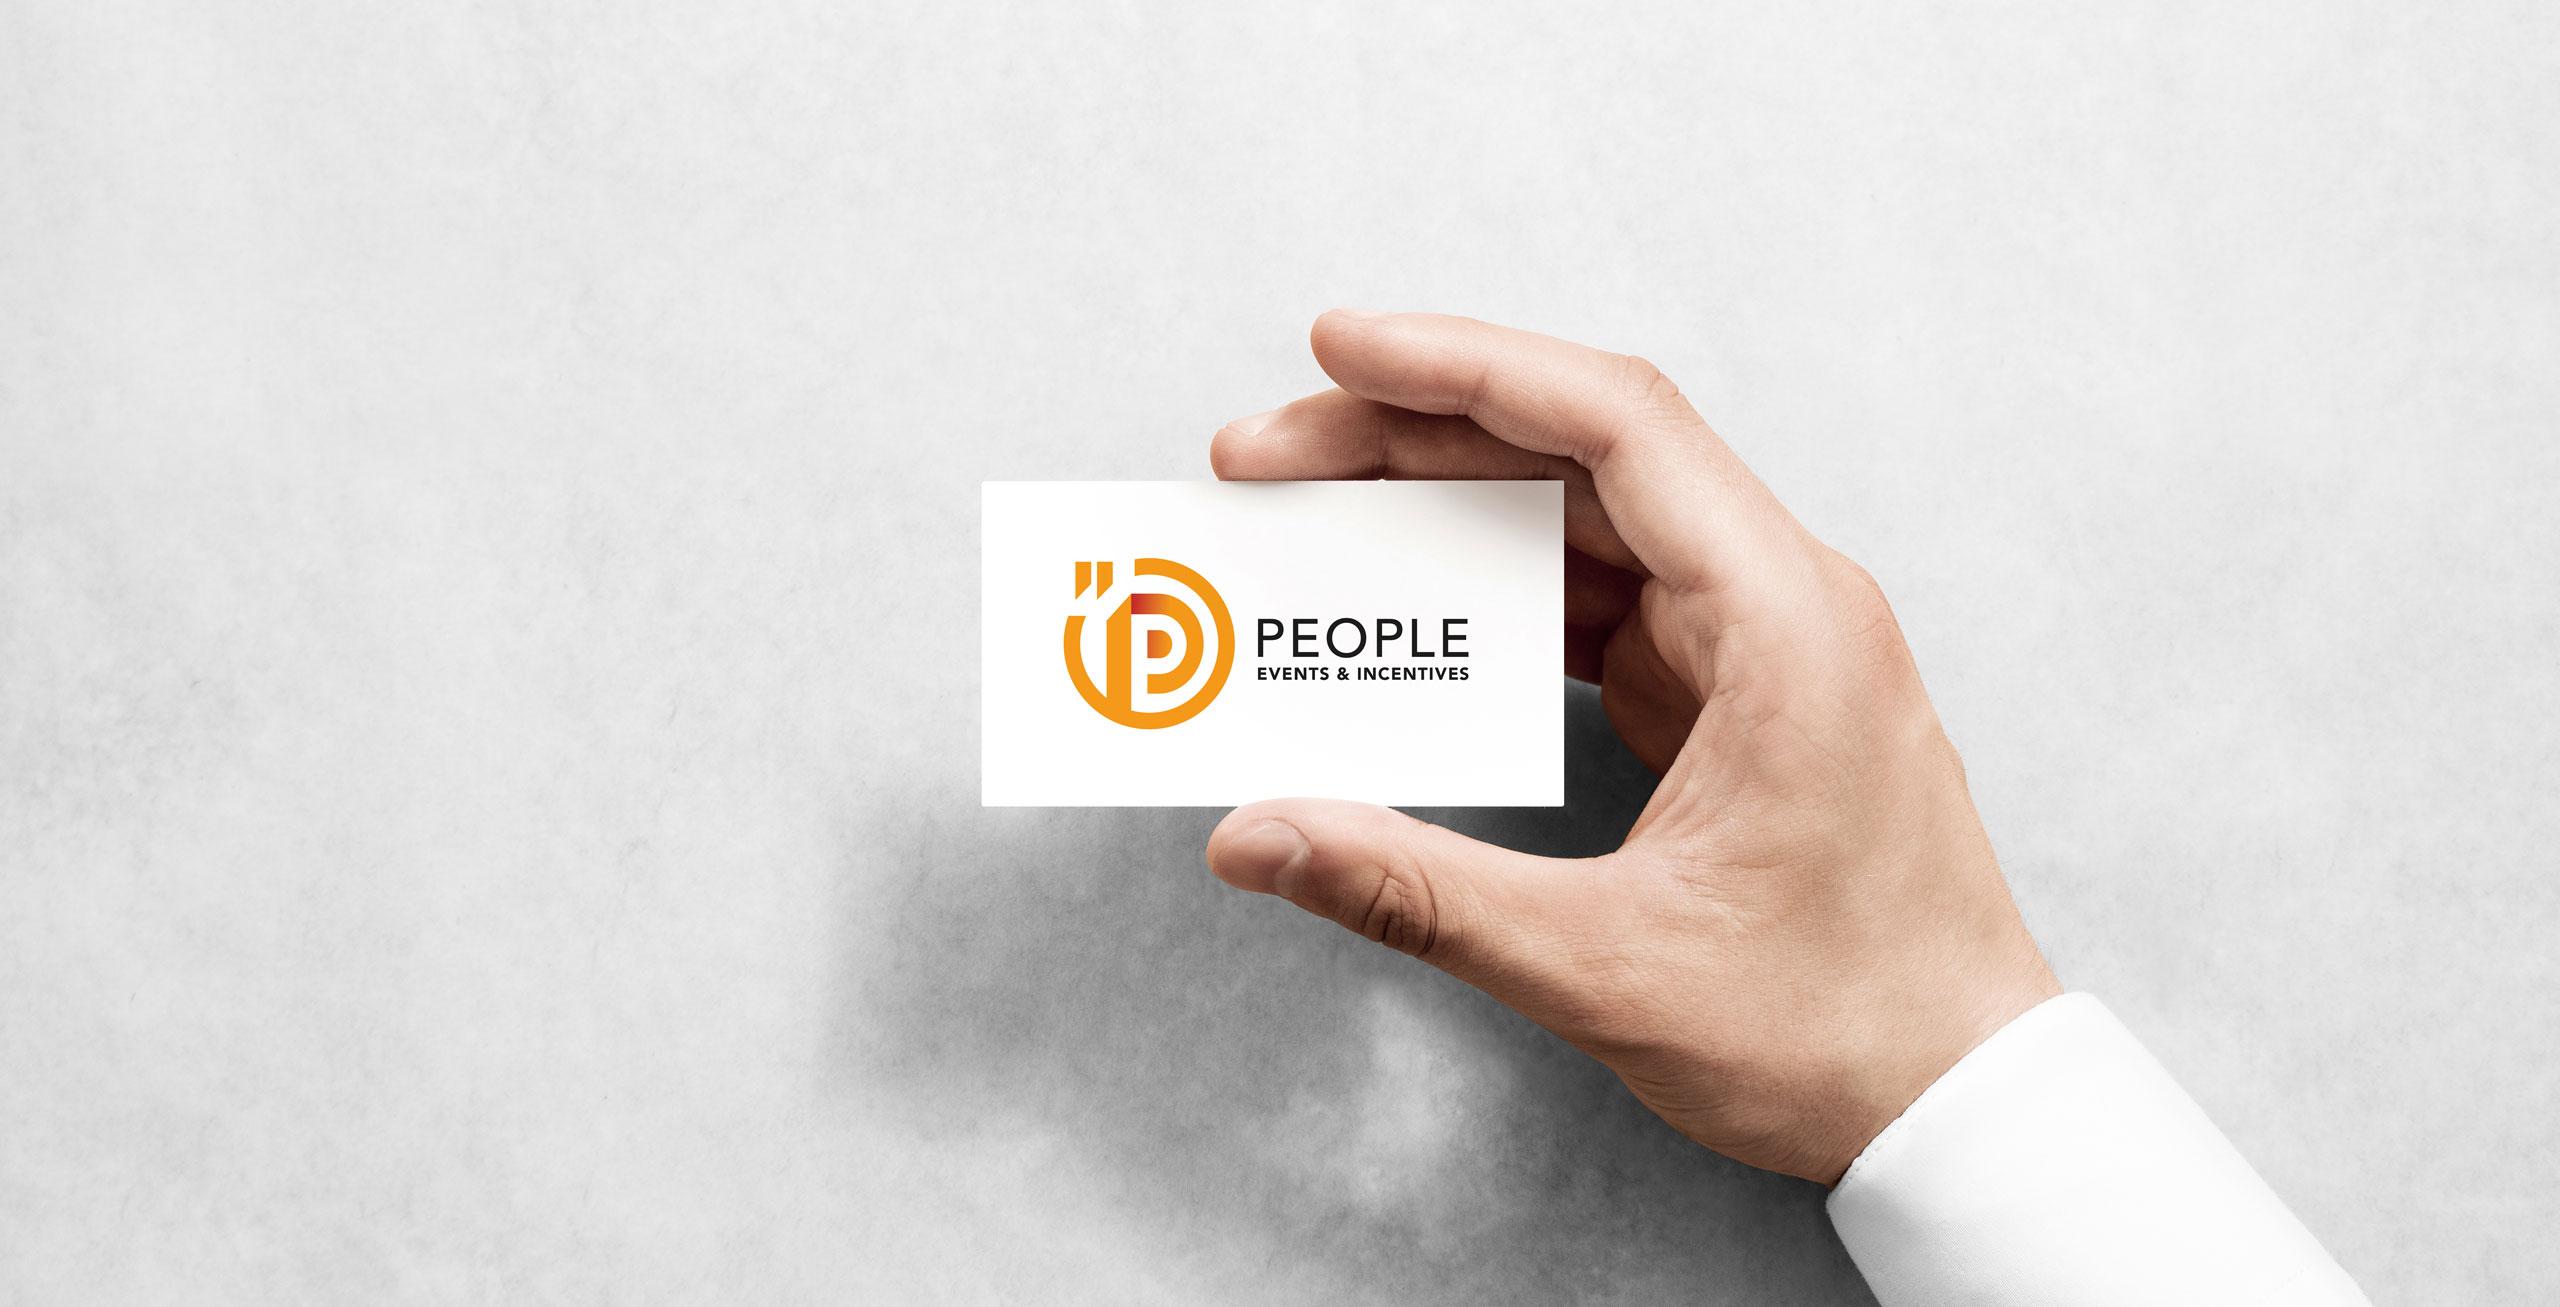 Hand_logo-Ppeople-2560x1307